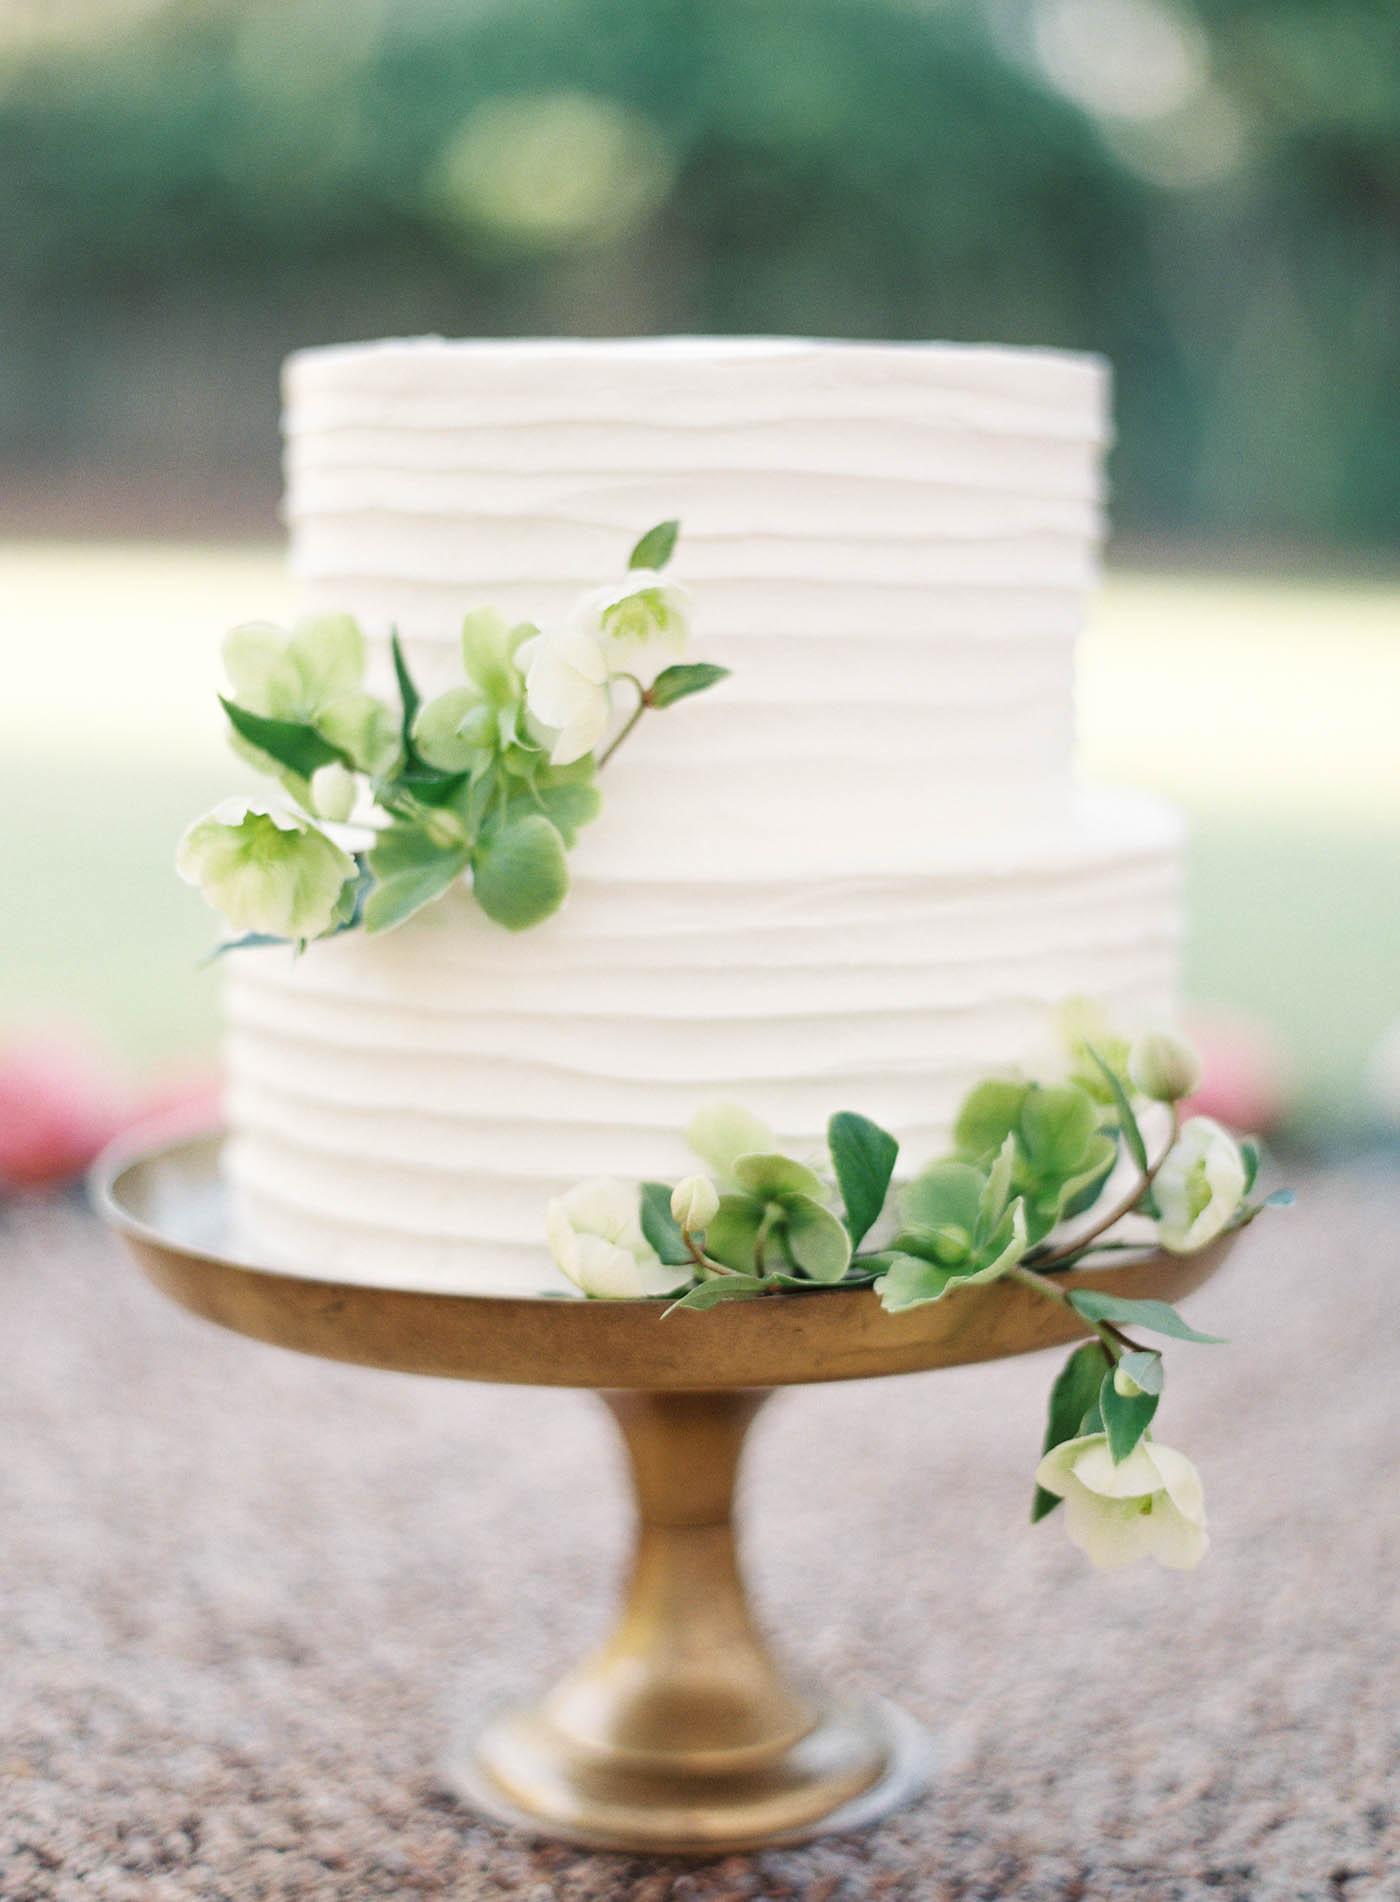 ojai-valley-inn-summer-wedding-jen-huang-45.jpg